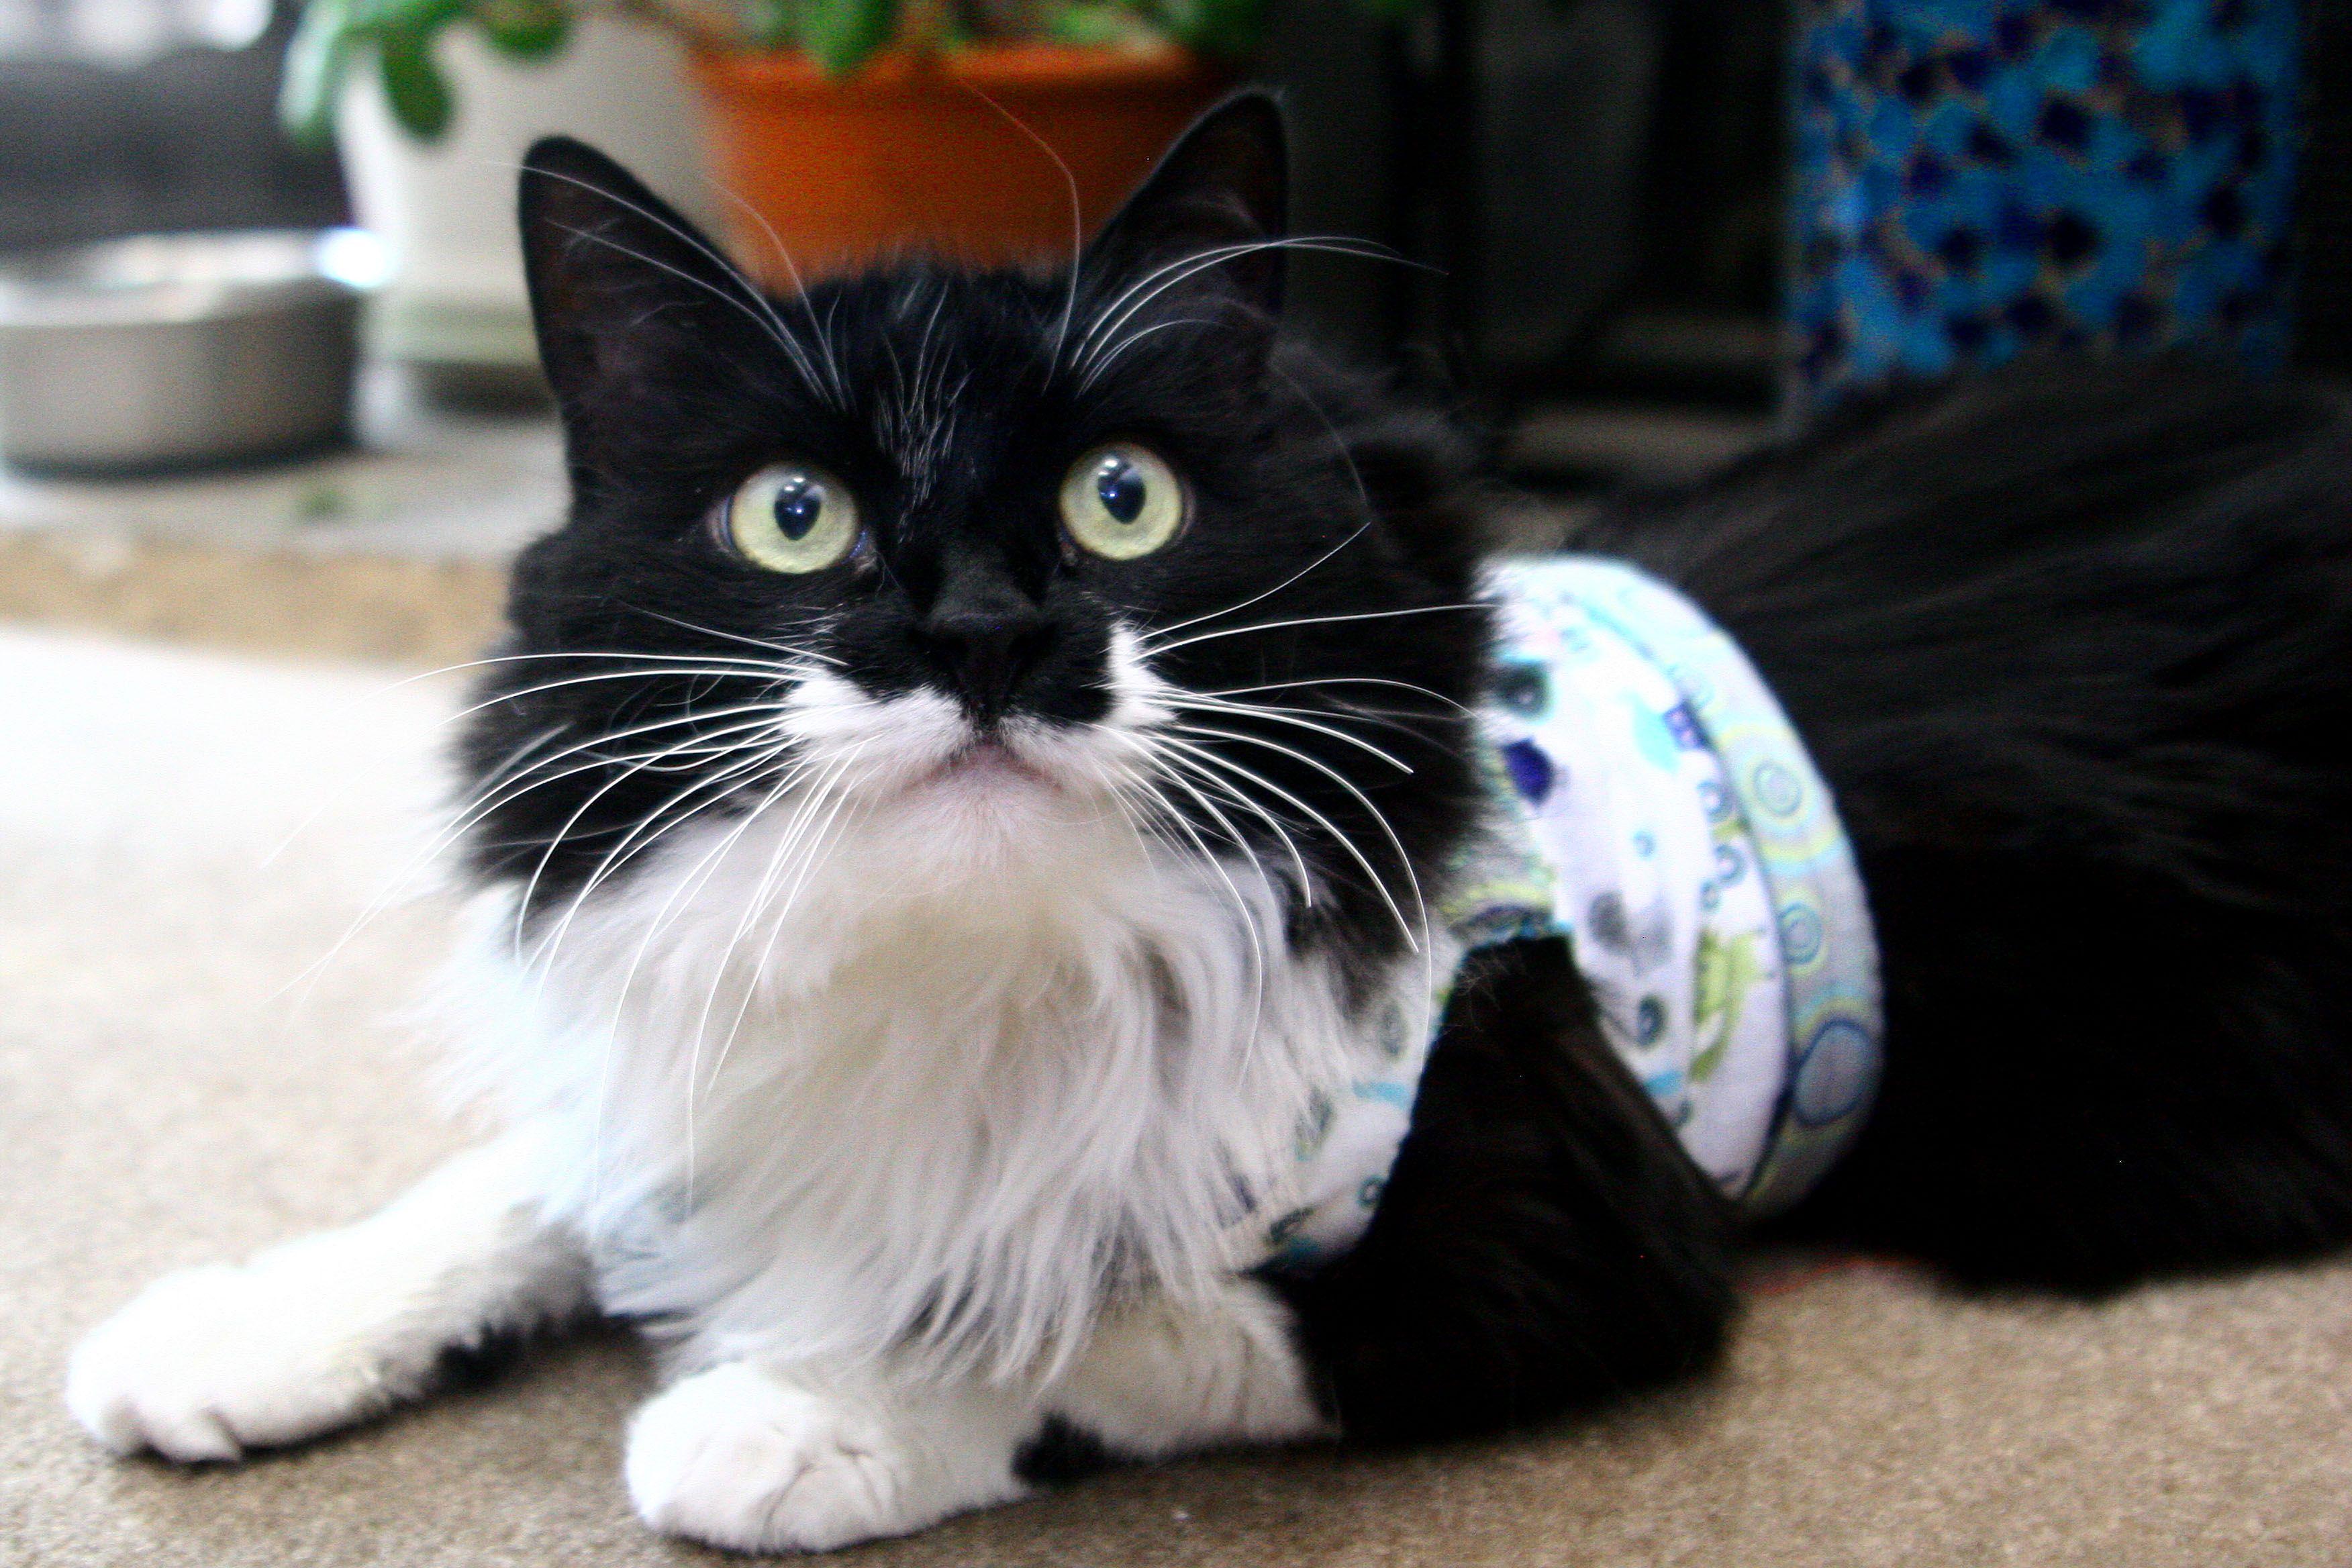 Homemade Cat Harness Cuteness Cat Harness Kitten Harness Cat Training